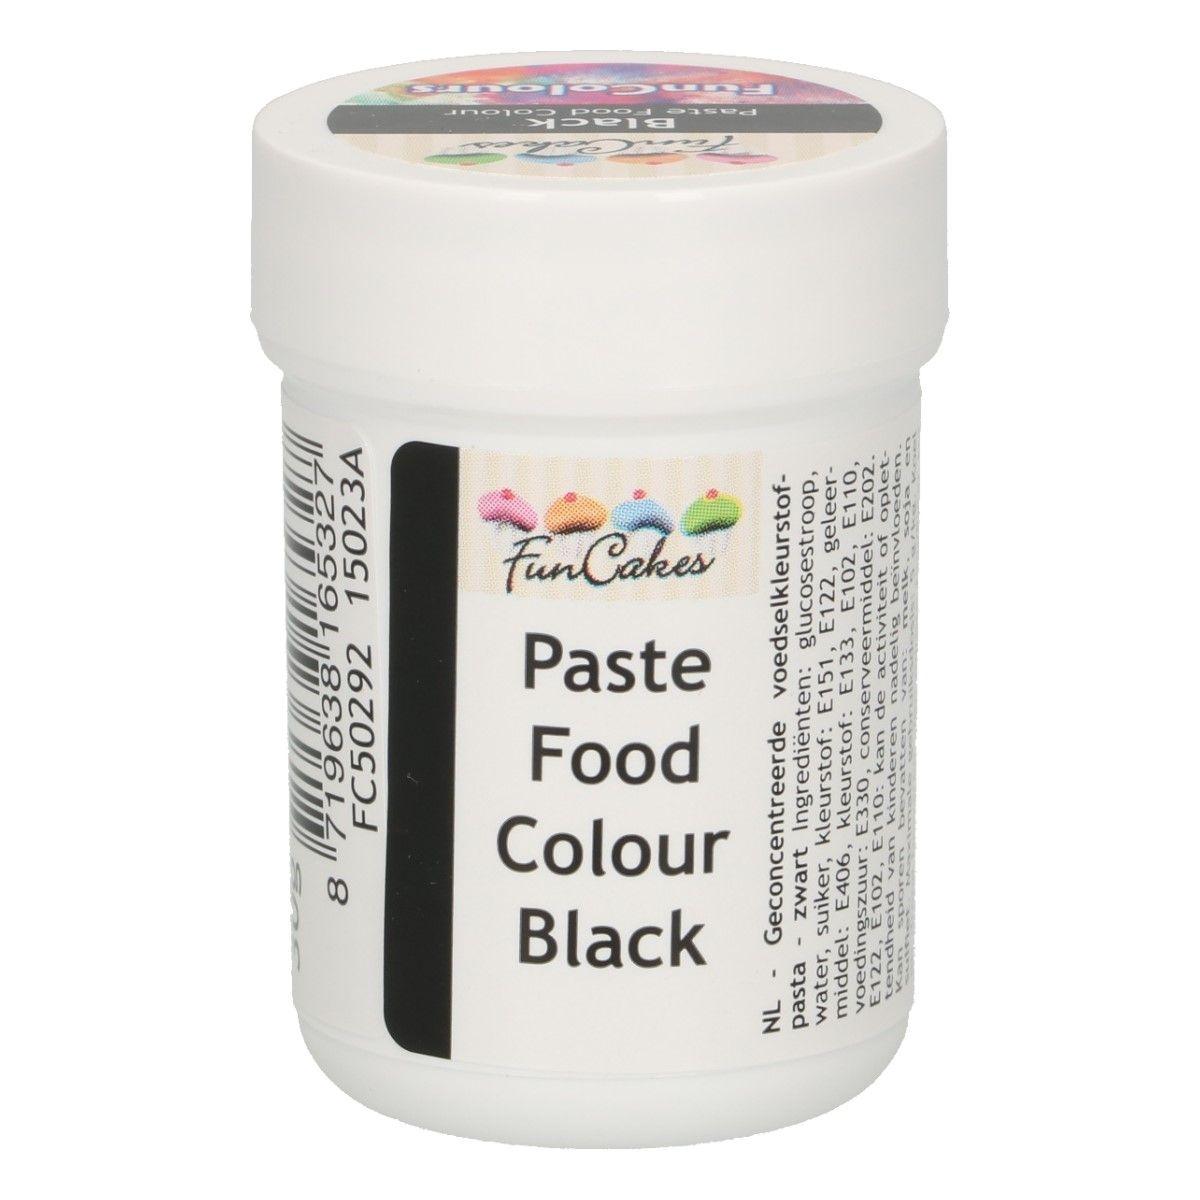 /f/u/funcakes_funcolours_paste_food_colour_-_black.jpg